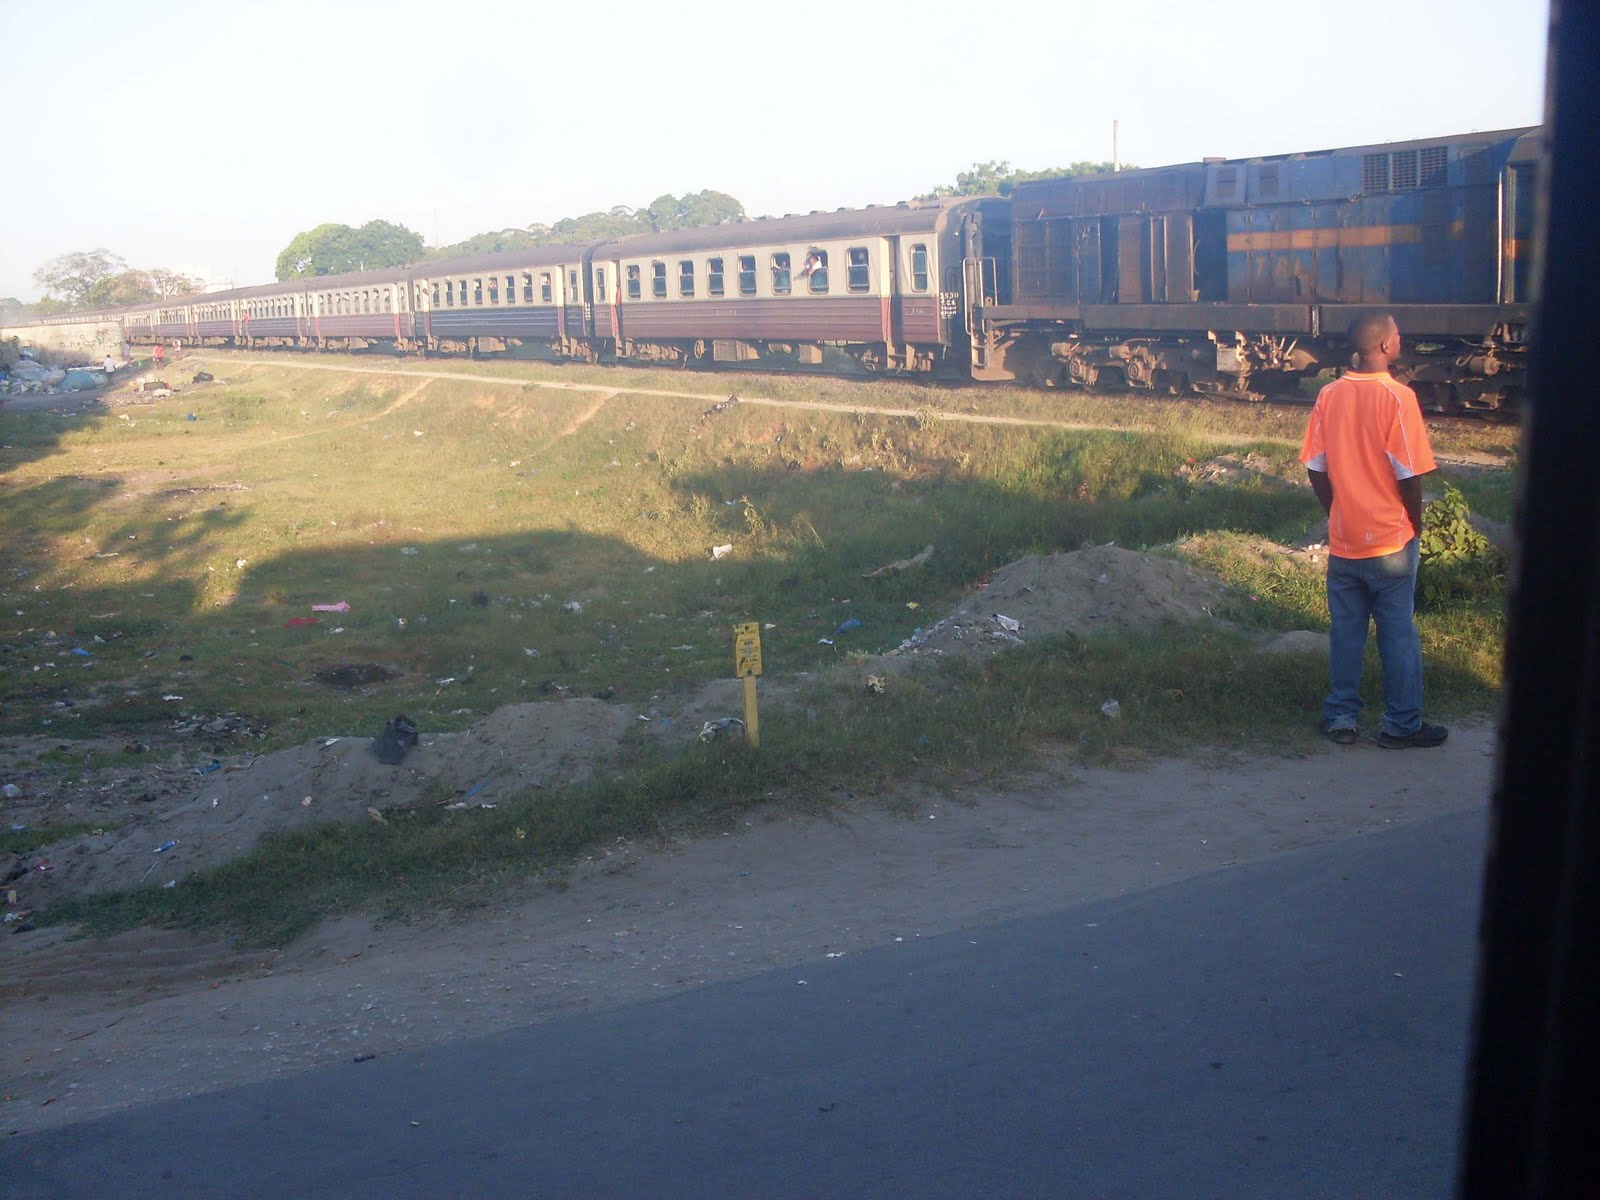 Tanzania Railways Corporation Tanzania Railways Corporation